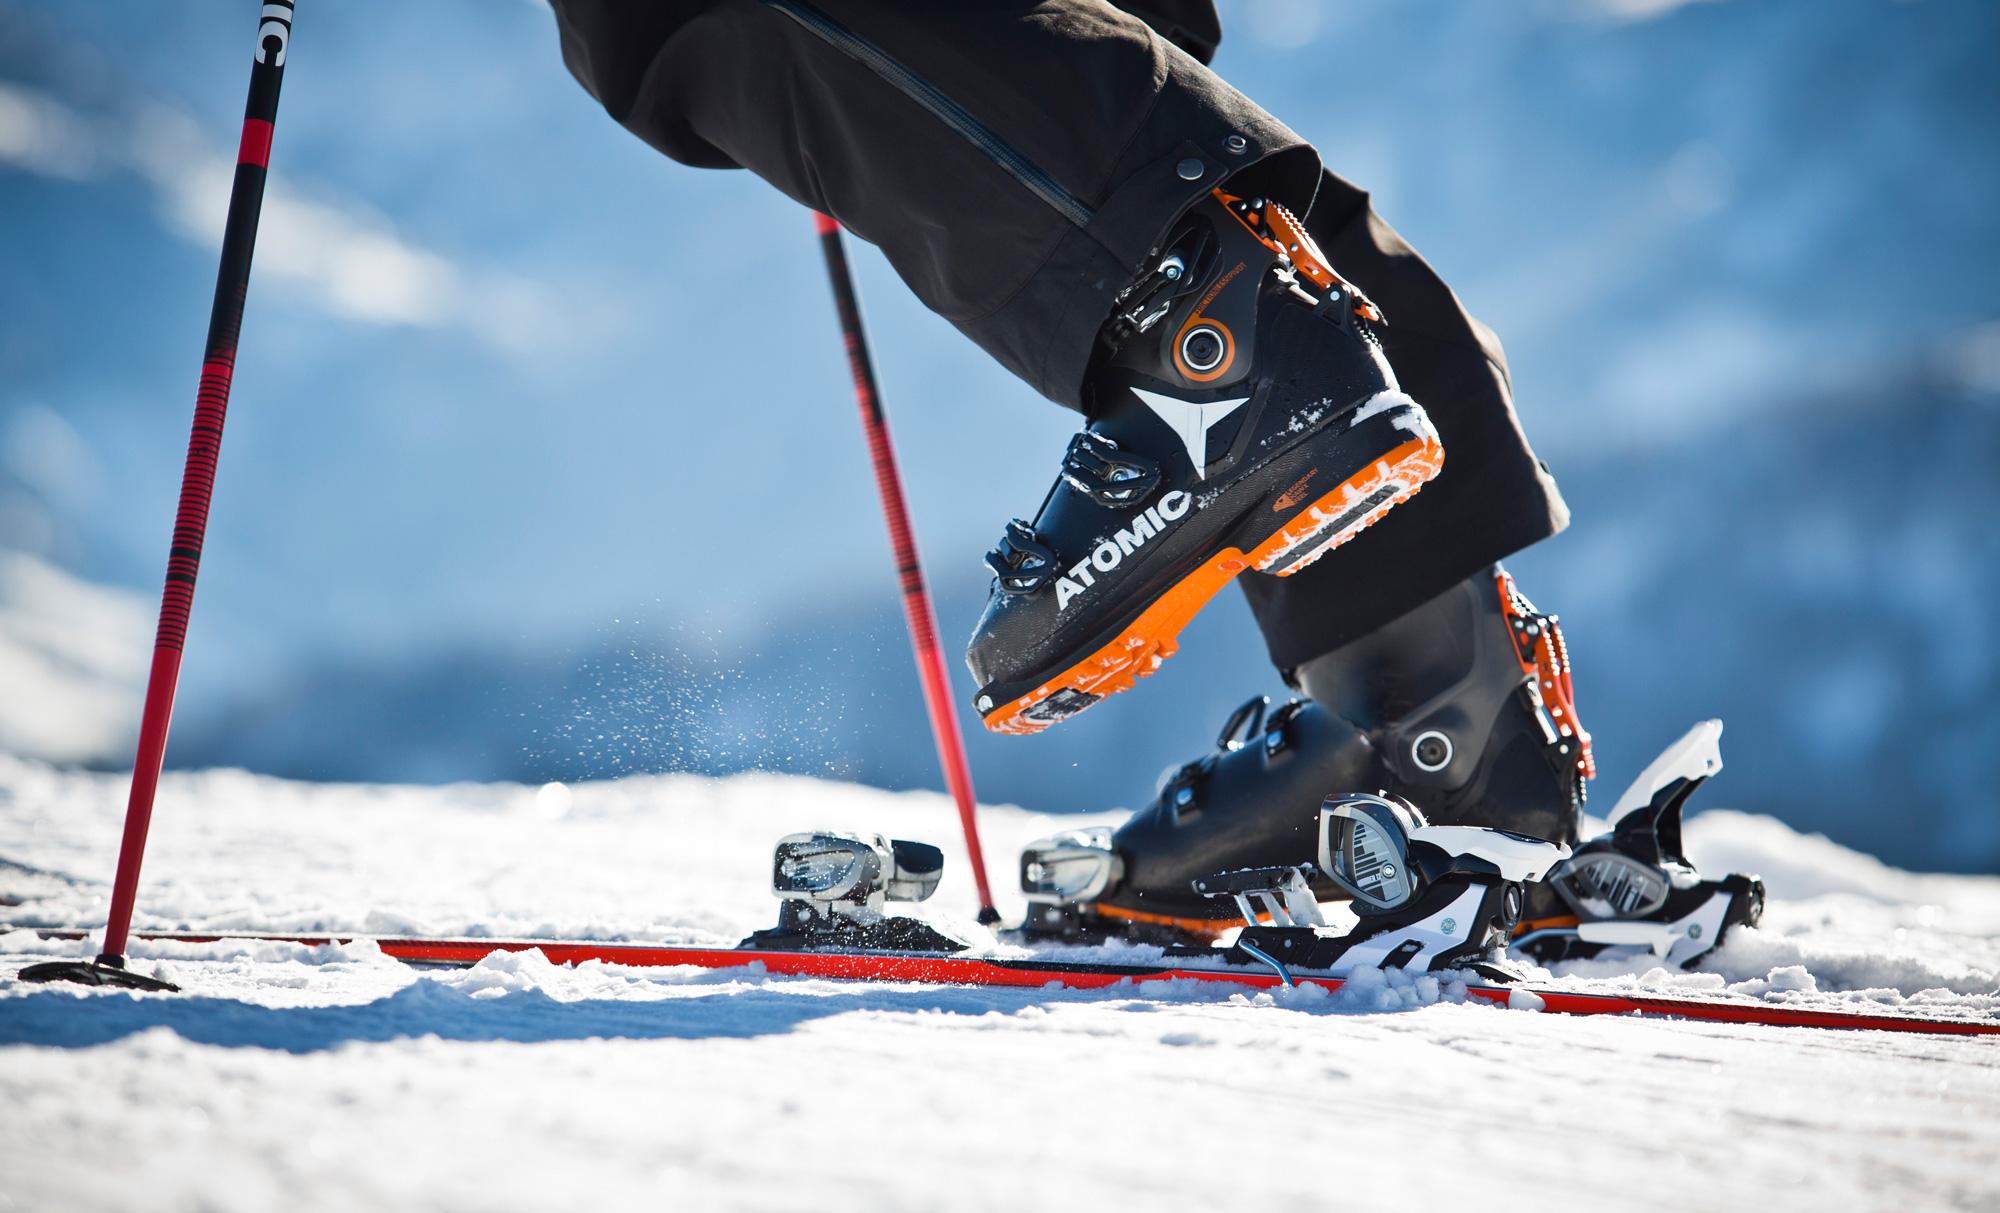 Buy Alpine Bindings Online At Sport Conrad